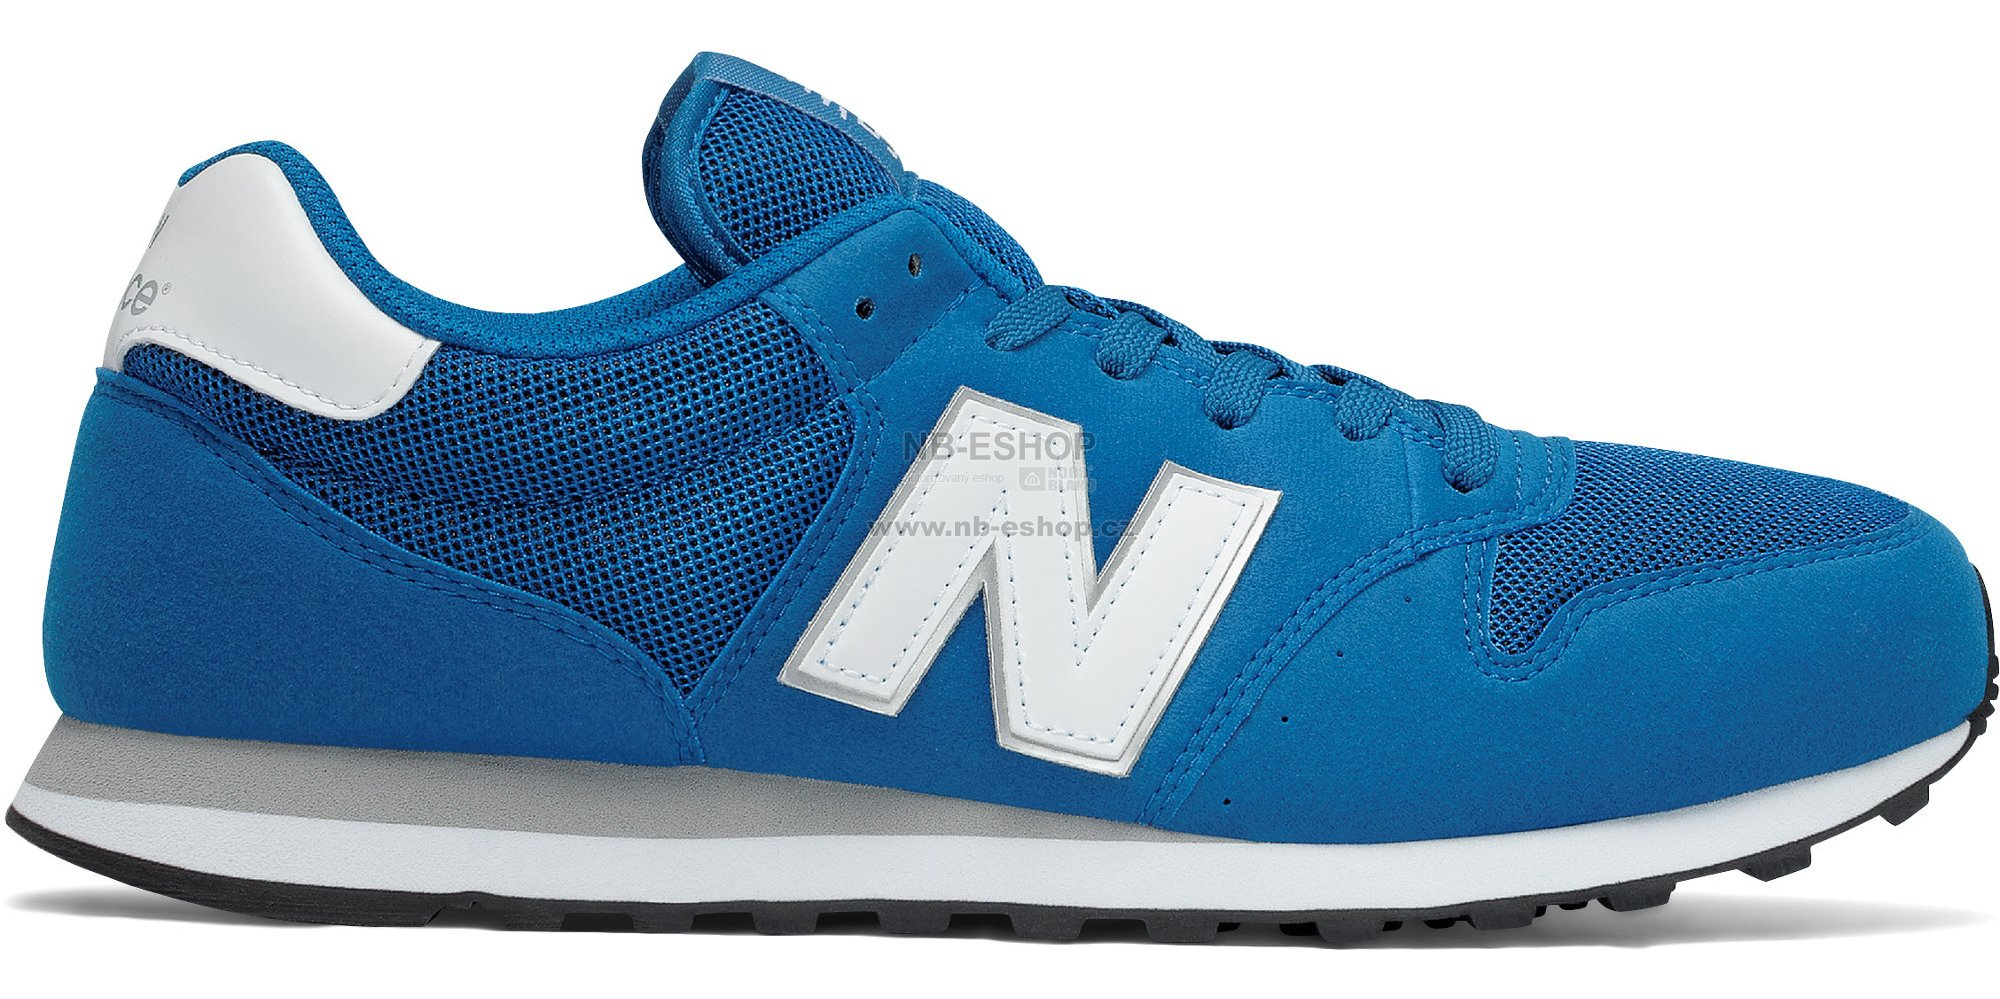 Pánská volnočasová obuv NEW BALANCE GM500BSW MODRÁ velikost  45 94cf694c6b5